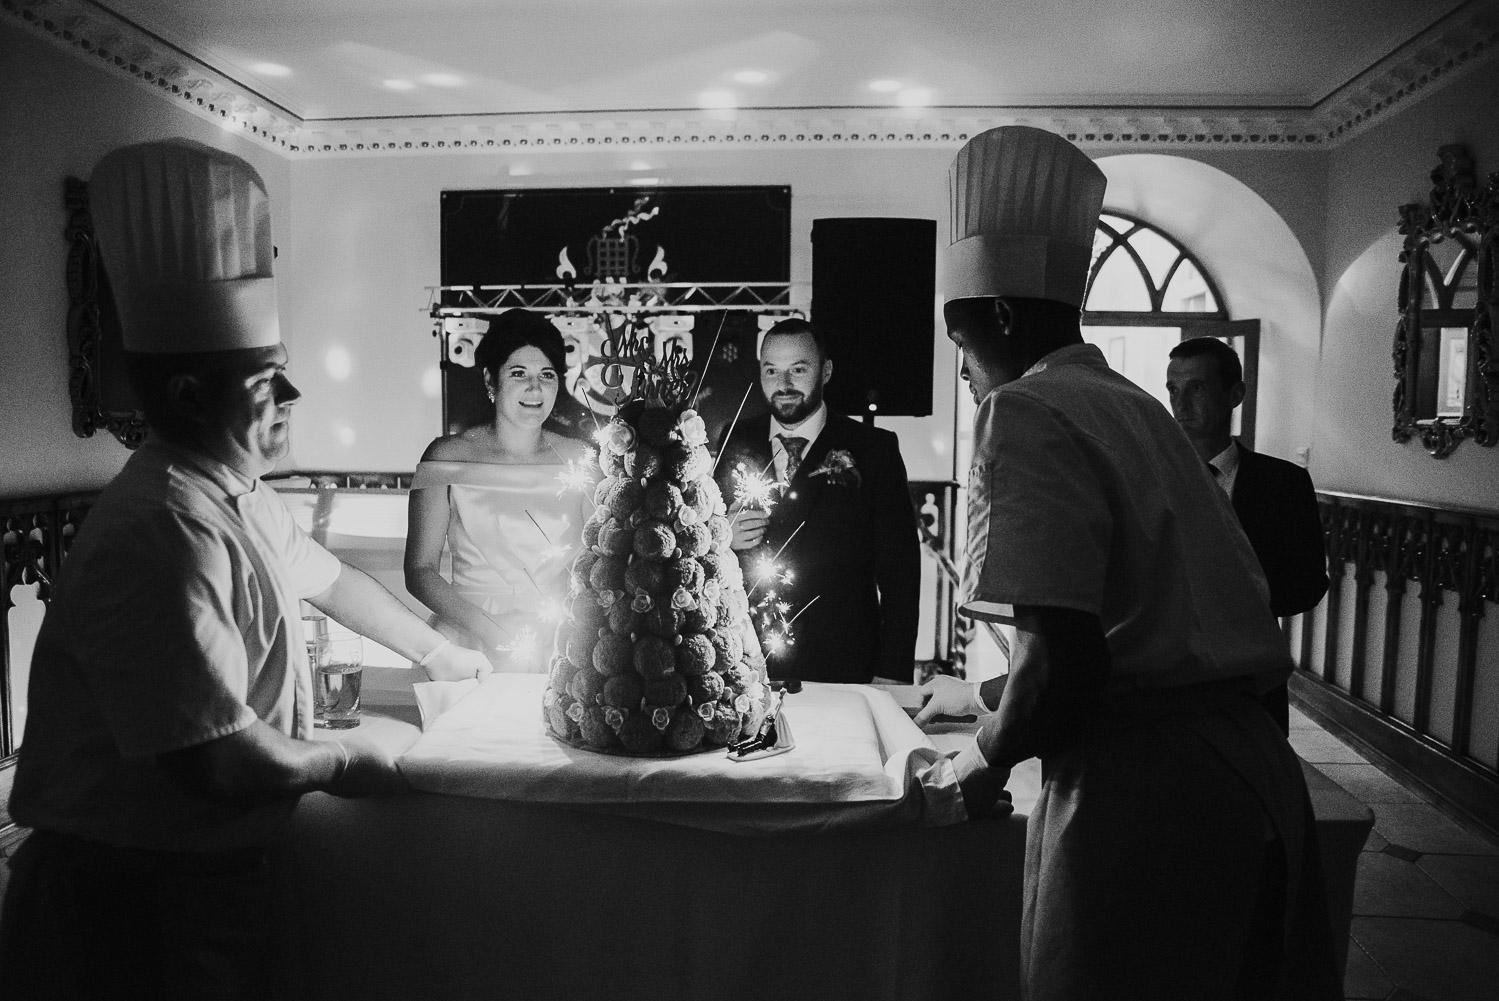 gascony_bordeaux_south_west_france_wedding_tarn_katy_webb_photography_UK94